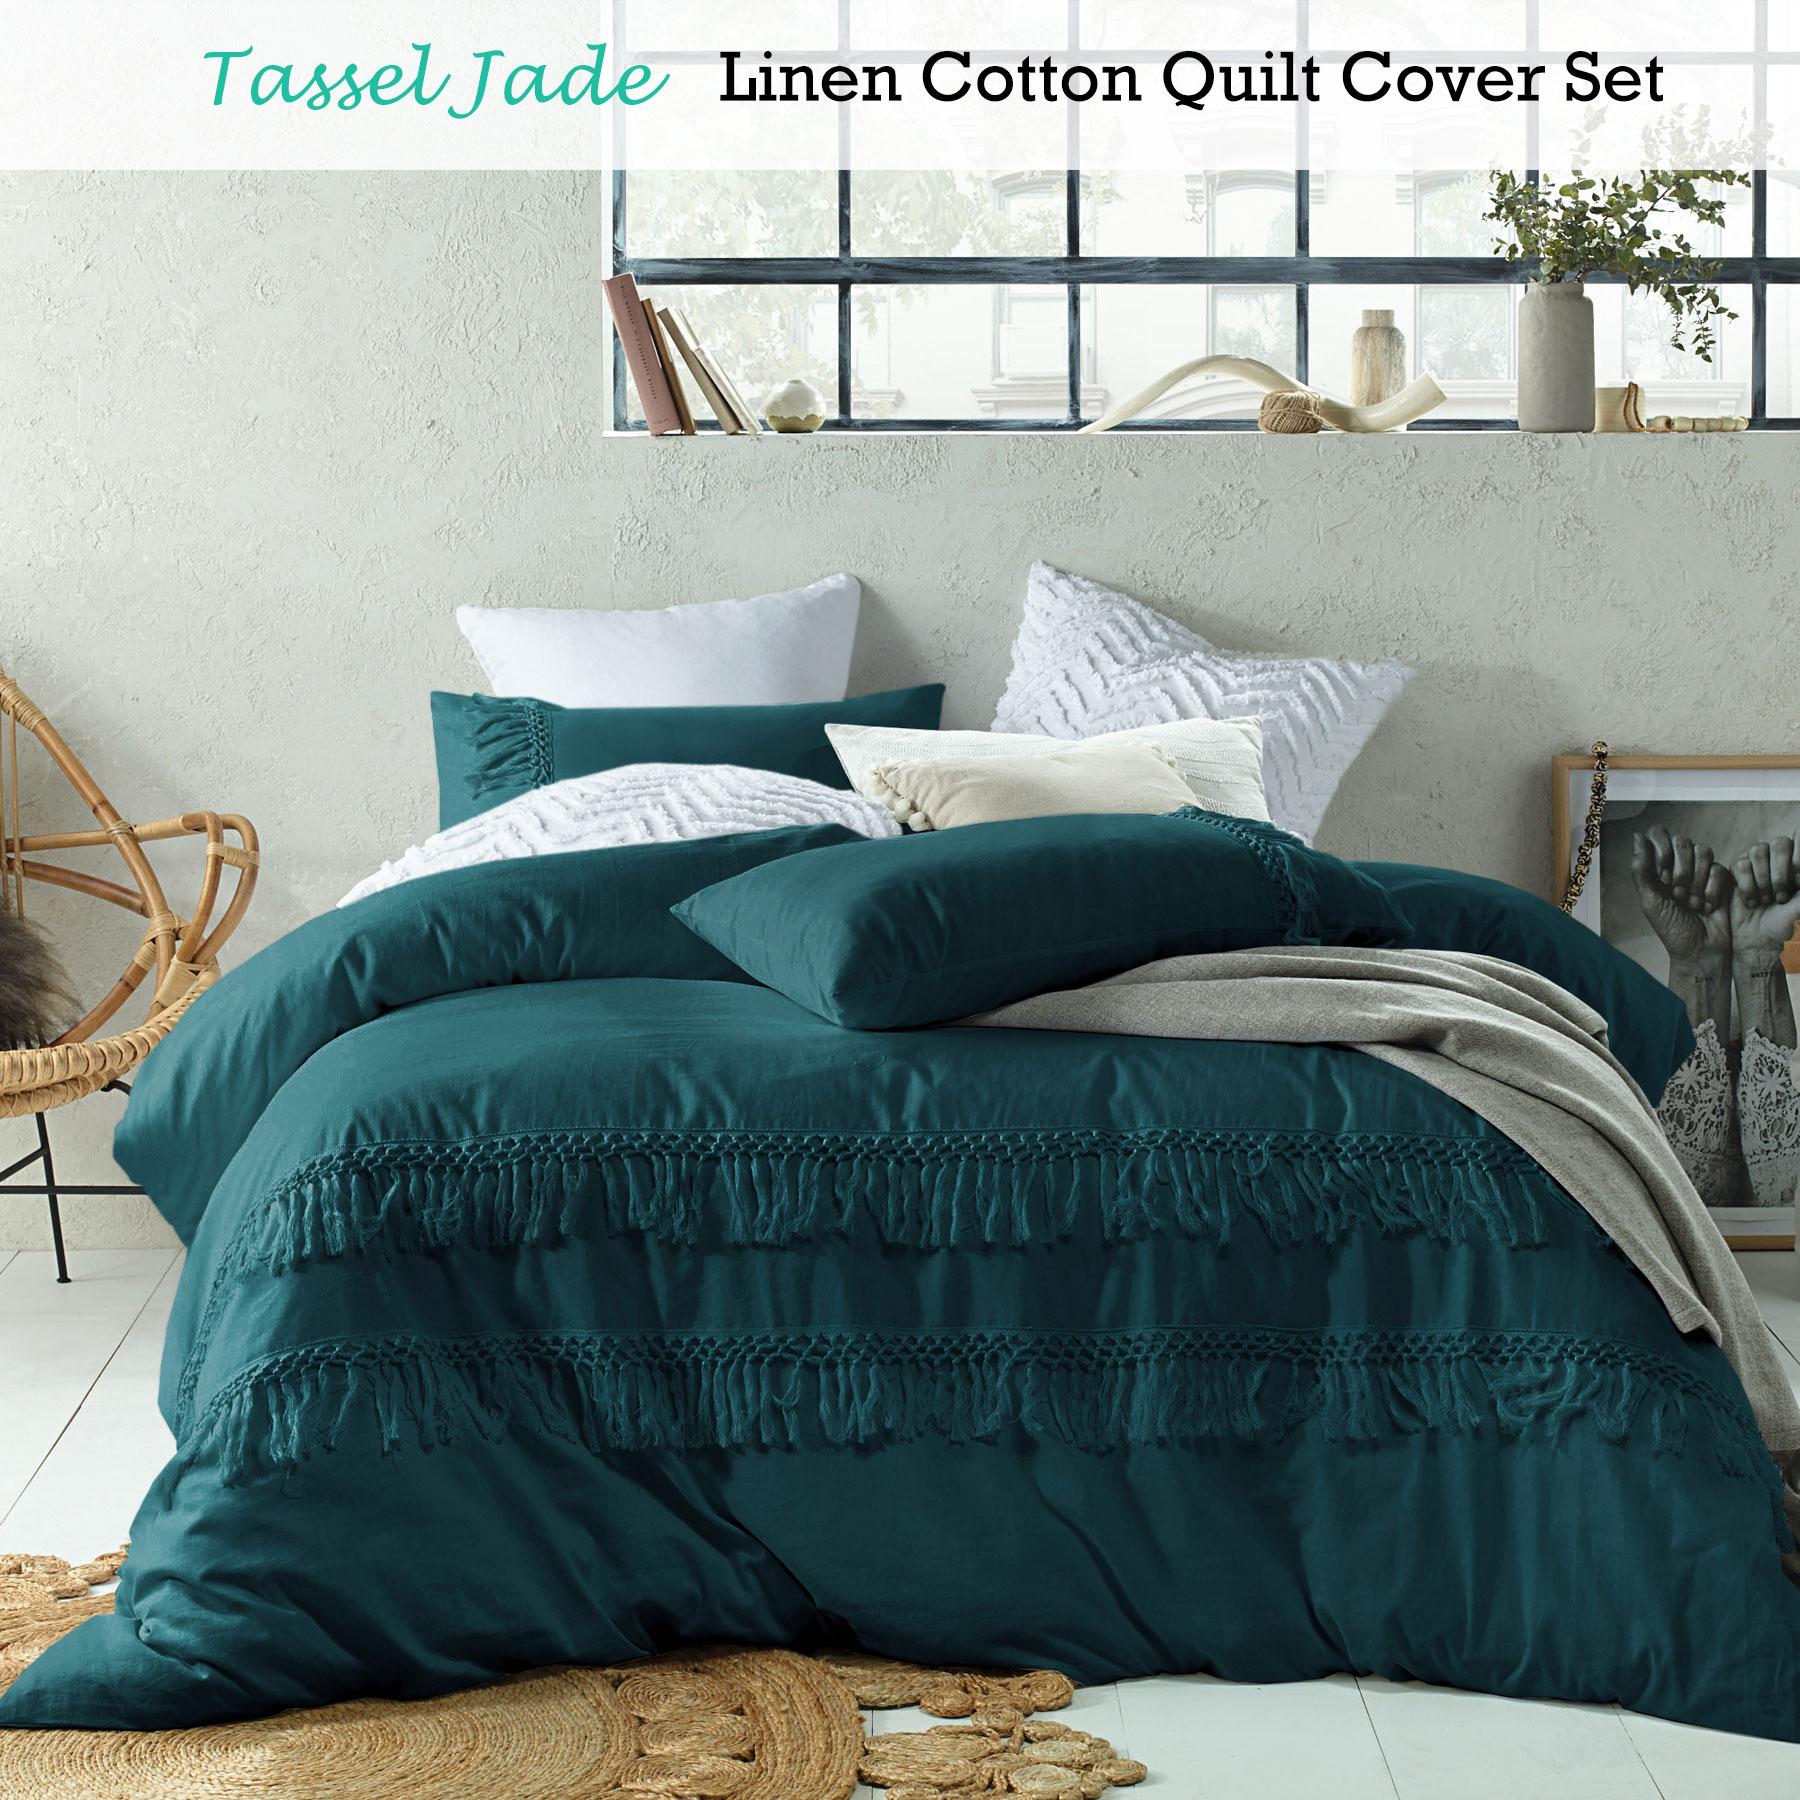 bb7ff7add3ad Details about Tassel JADE Linen Cotton Quilt Duvet Cover Set - DOUBLE QUEEN  KING Super King